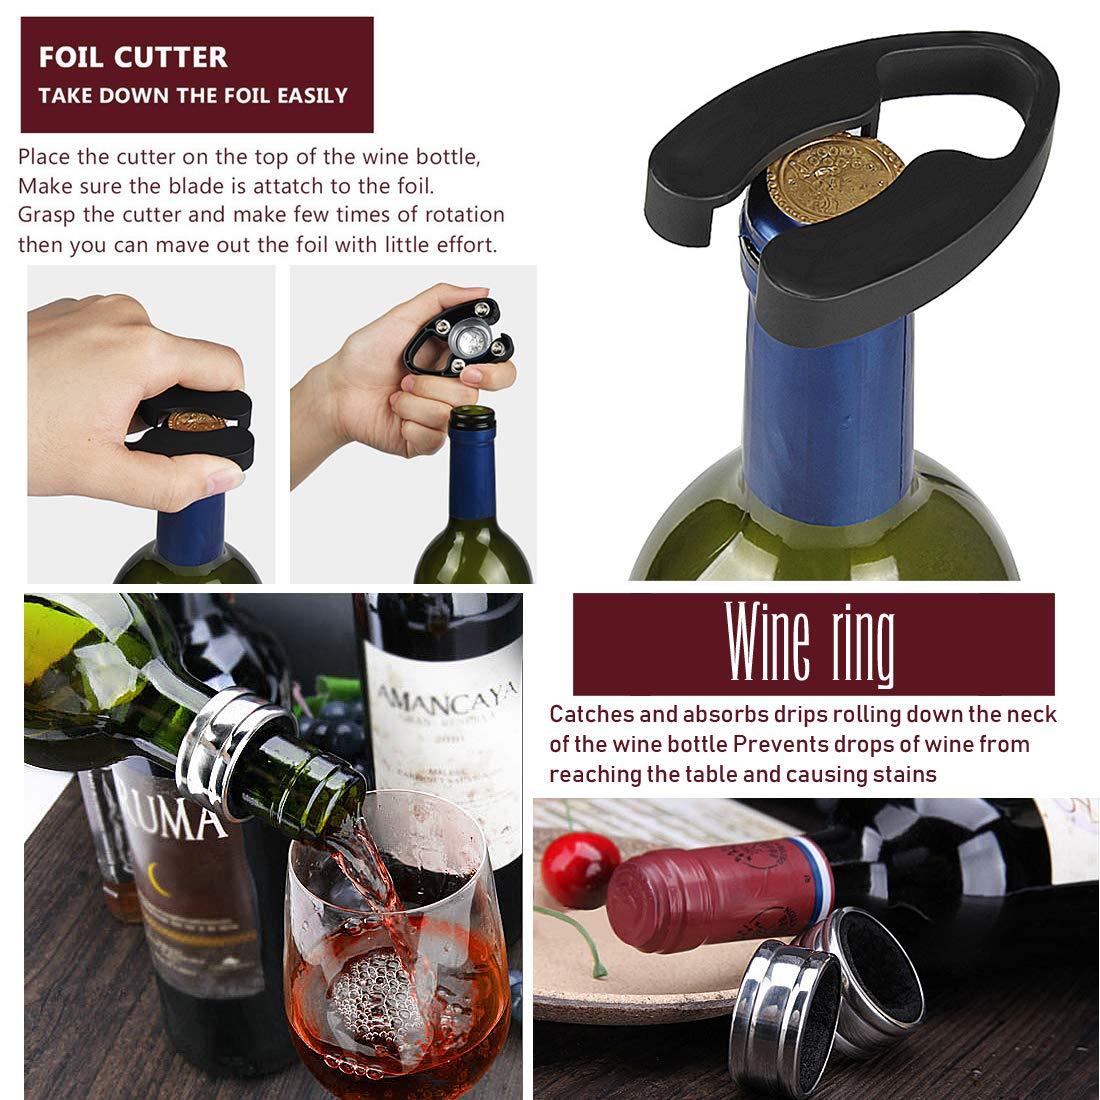 Wine Opener Set,Wine Accessories Gift Set Wine 4 Set YOBANSA Wing Corkscrew,Wine Bottle Opener Wine Stopper Foil Cutter,Creative Waiters Corkscrew